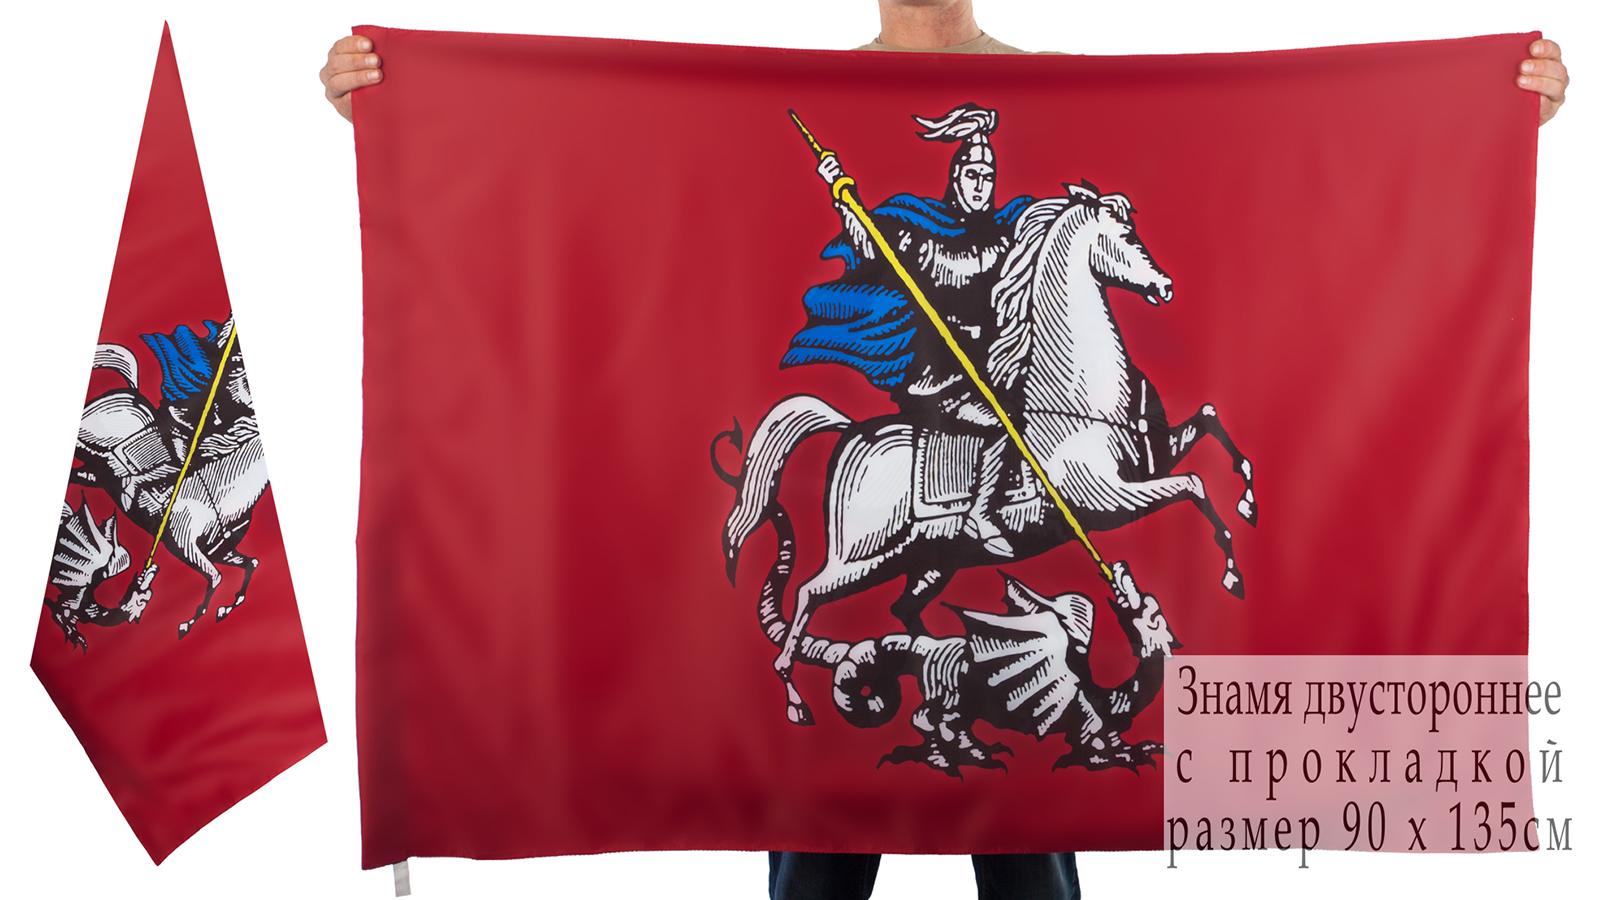 Двусторонний флаг Москвы